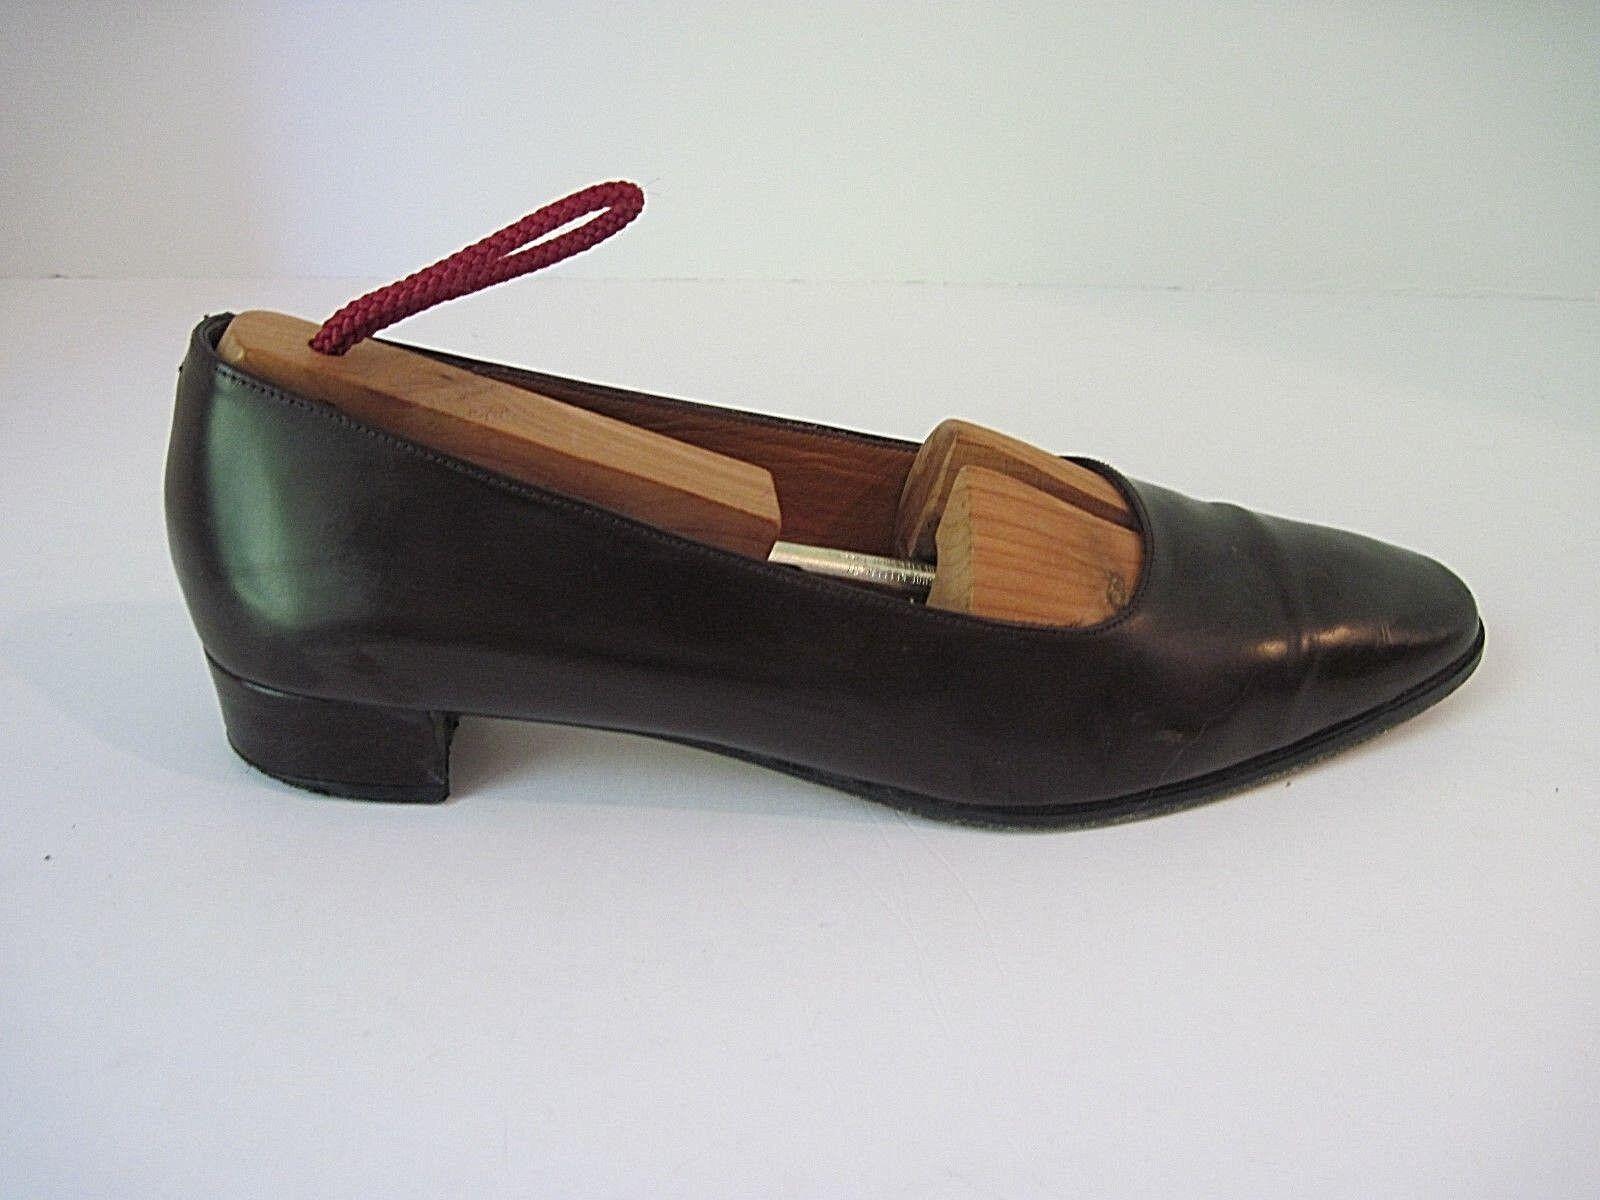 Vintage RALPH LAUREN Dark marrone Pelle Classic Flats Low Heel Flats Classic Spain Taglia 7B a89c4d